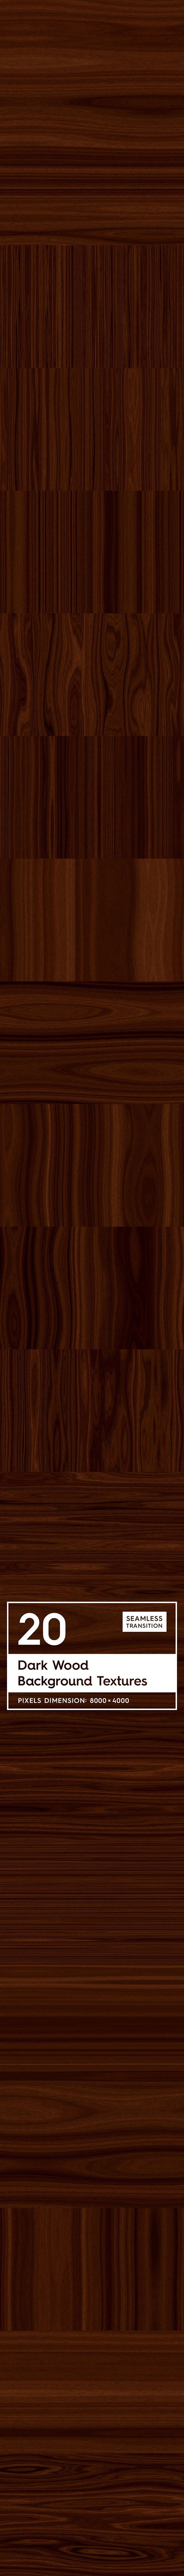 20 Dark Wood Background Textures. Macro #darktree #surface